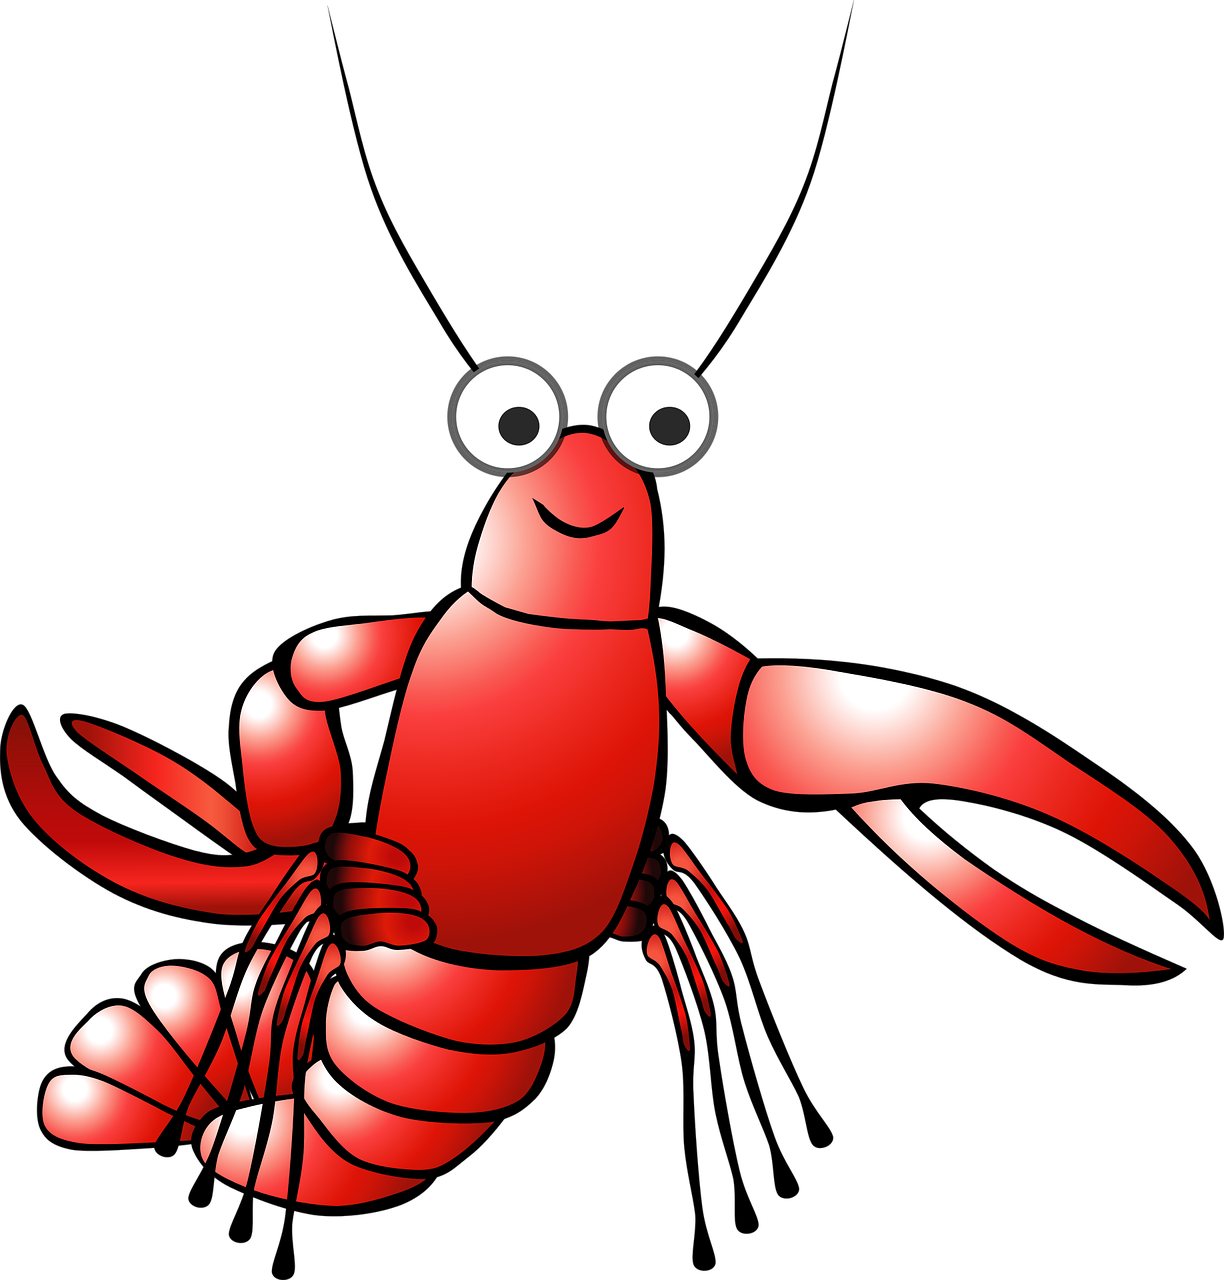 Kartun Udang Karang Lobster - Gambar Vektor Gratis Di Pixabay